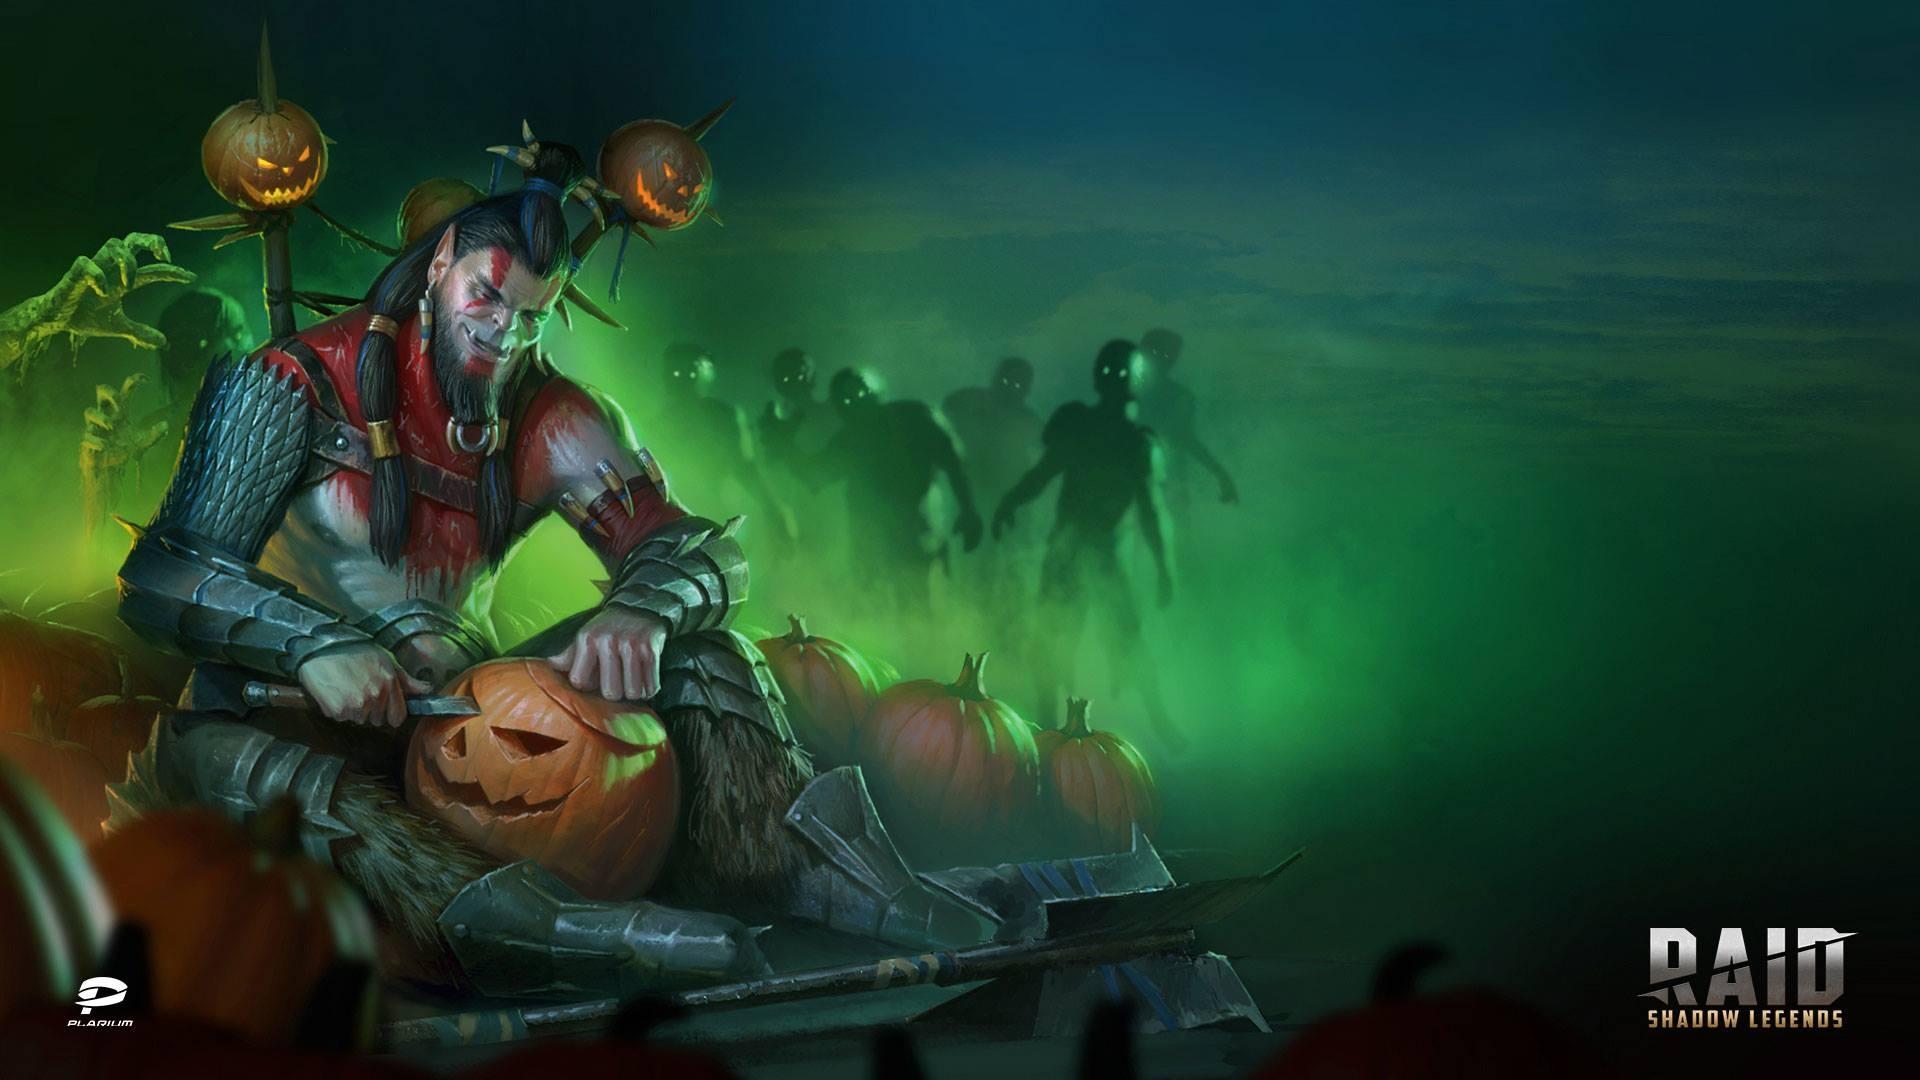 Raid Shadow Legends background picture